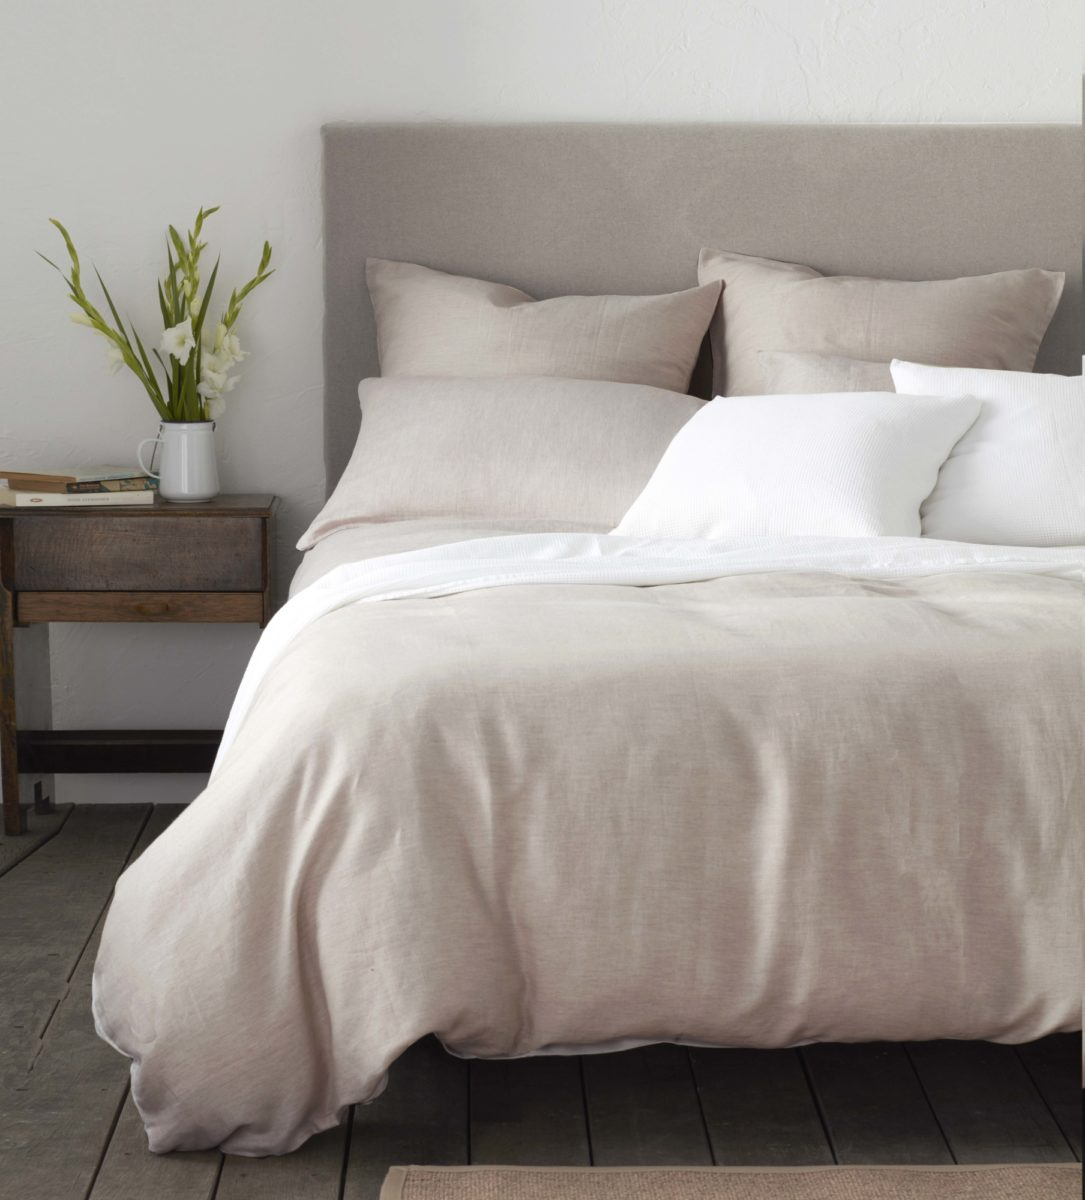 healthy linen for good sleep